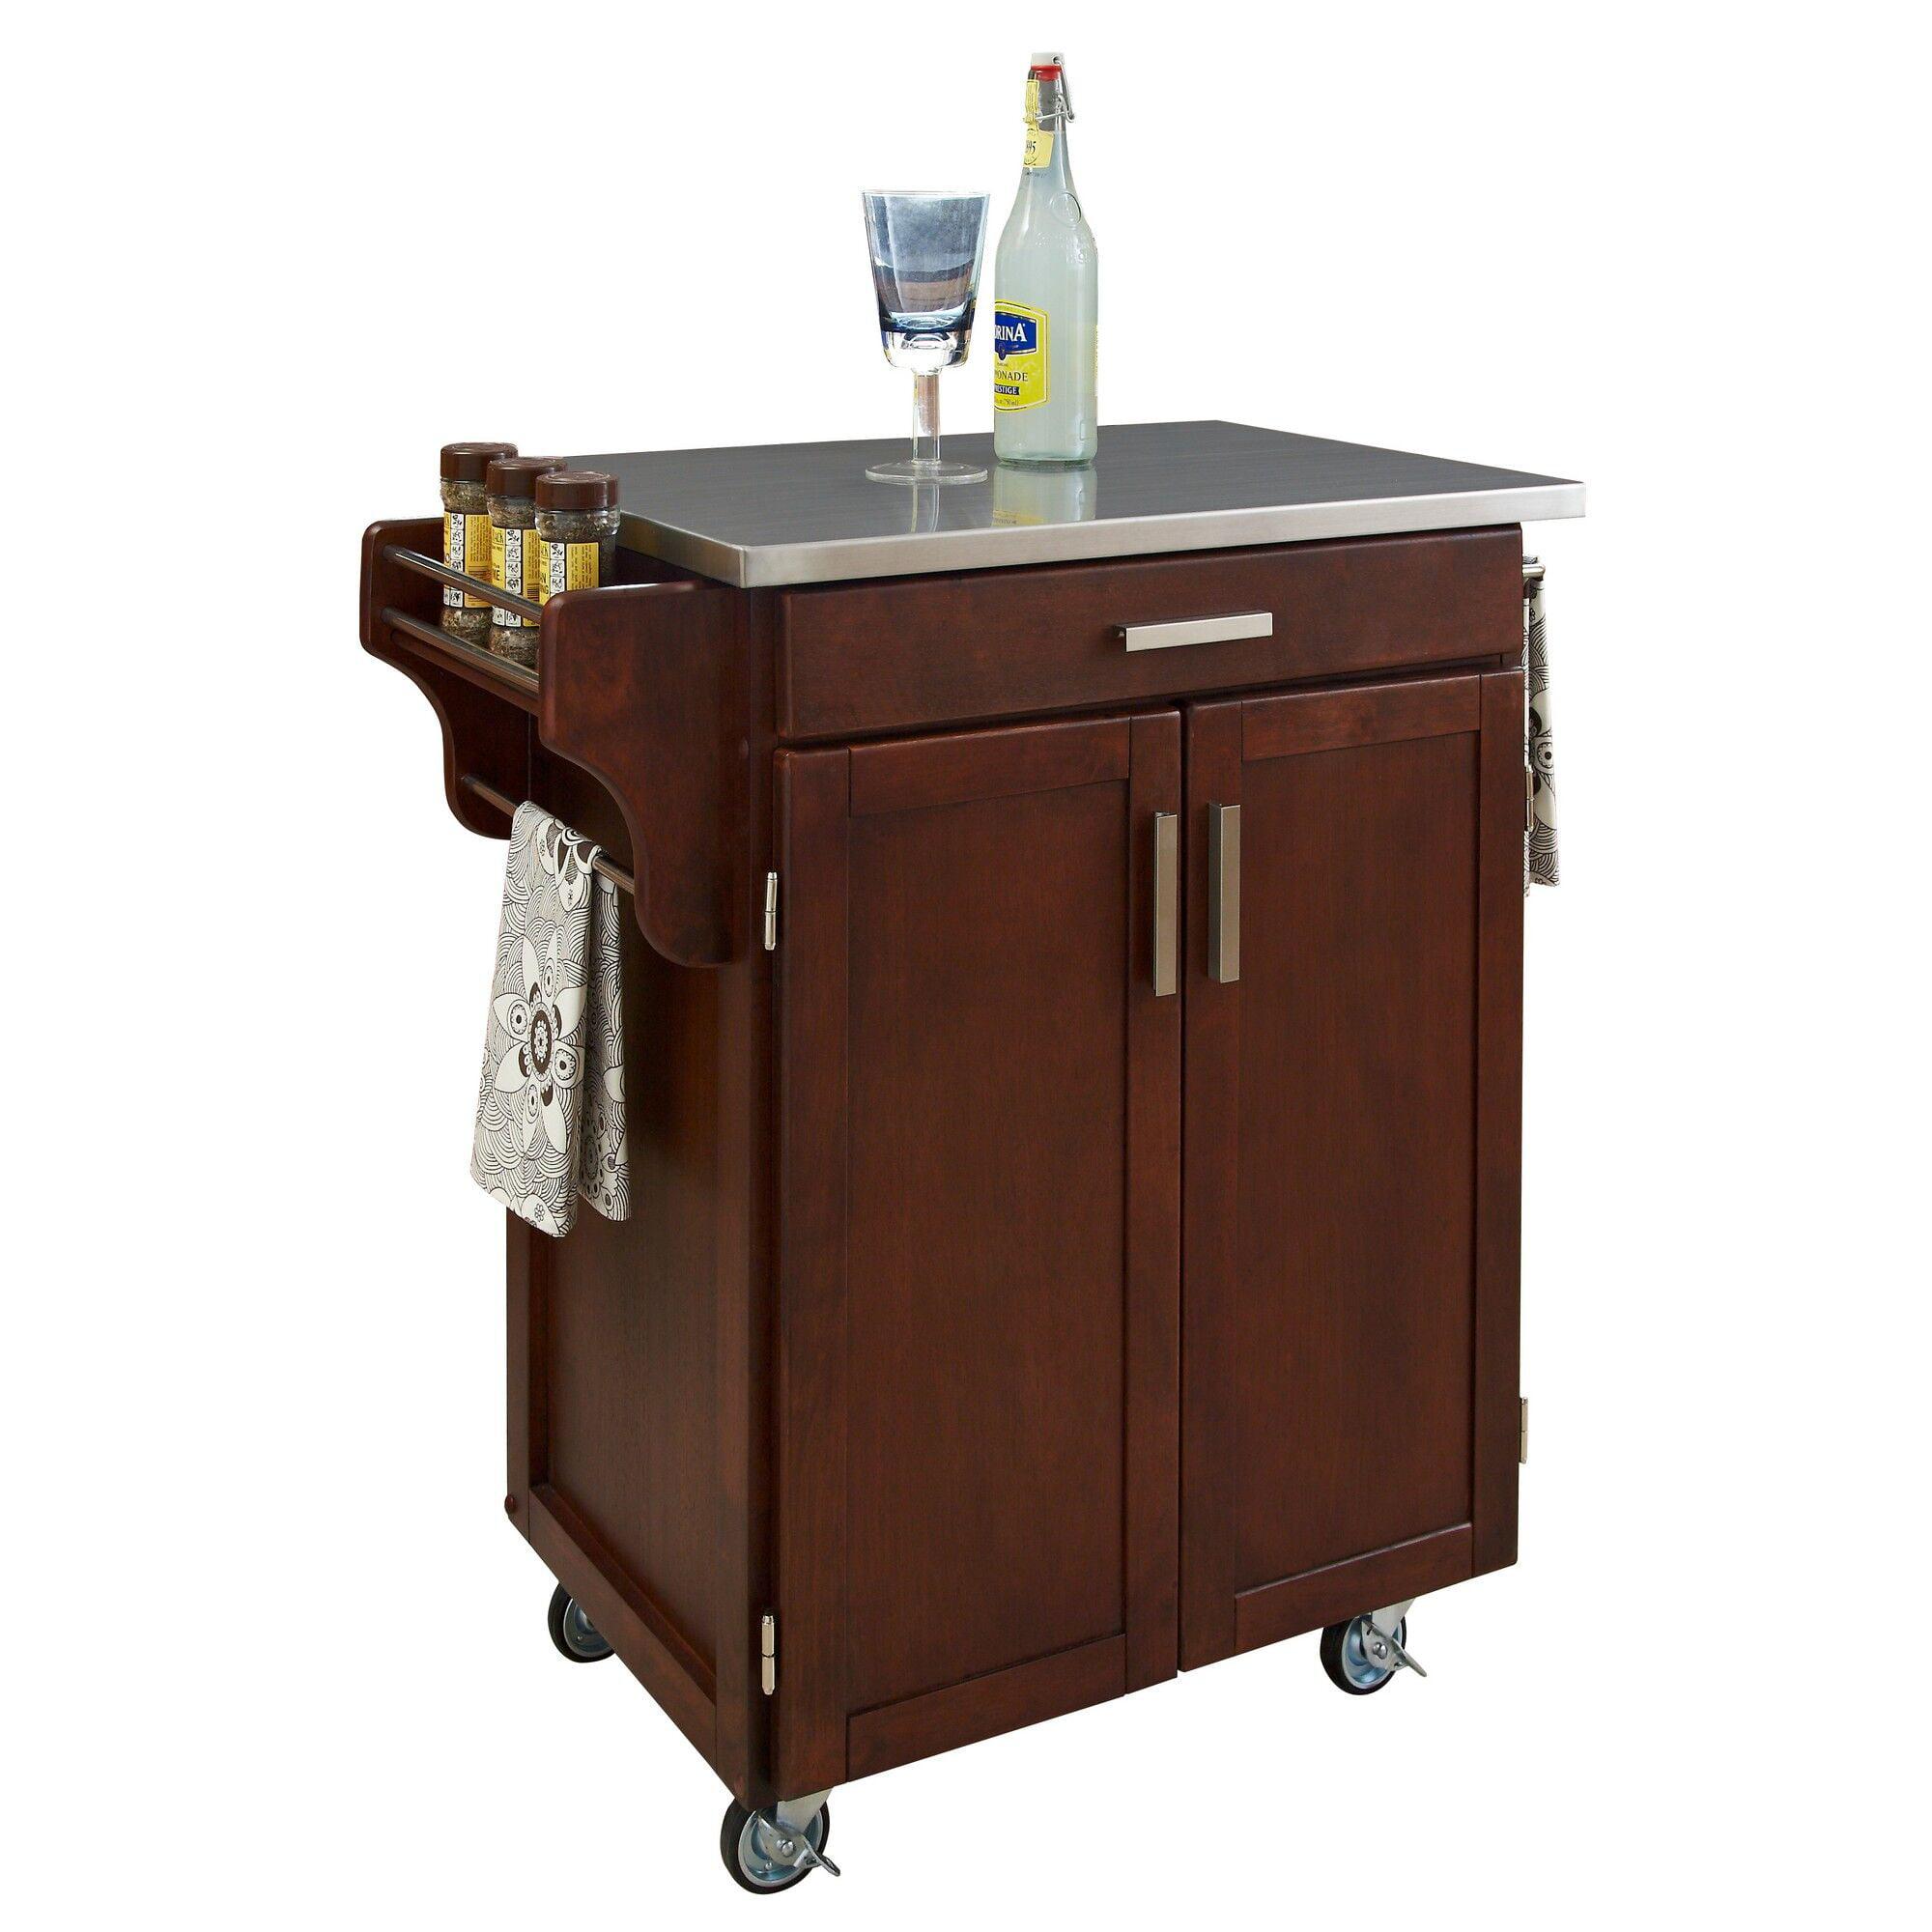 Home Styles Kitchen Cart Black Stainless Steel Top Walmart Com Walmart Com